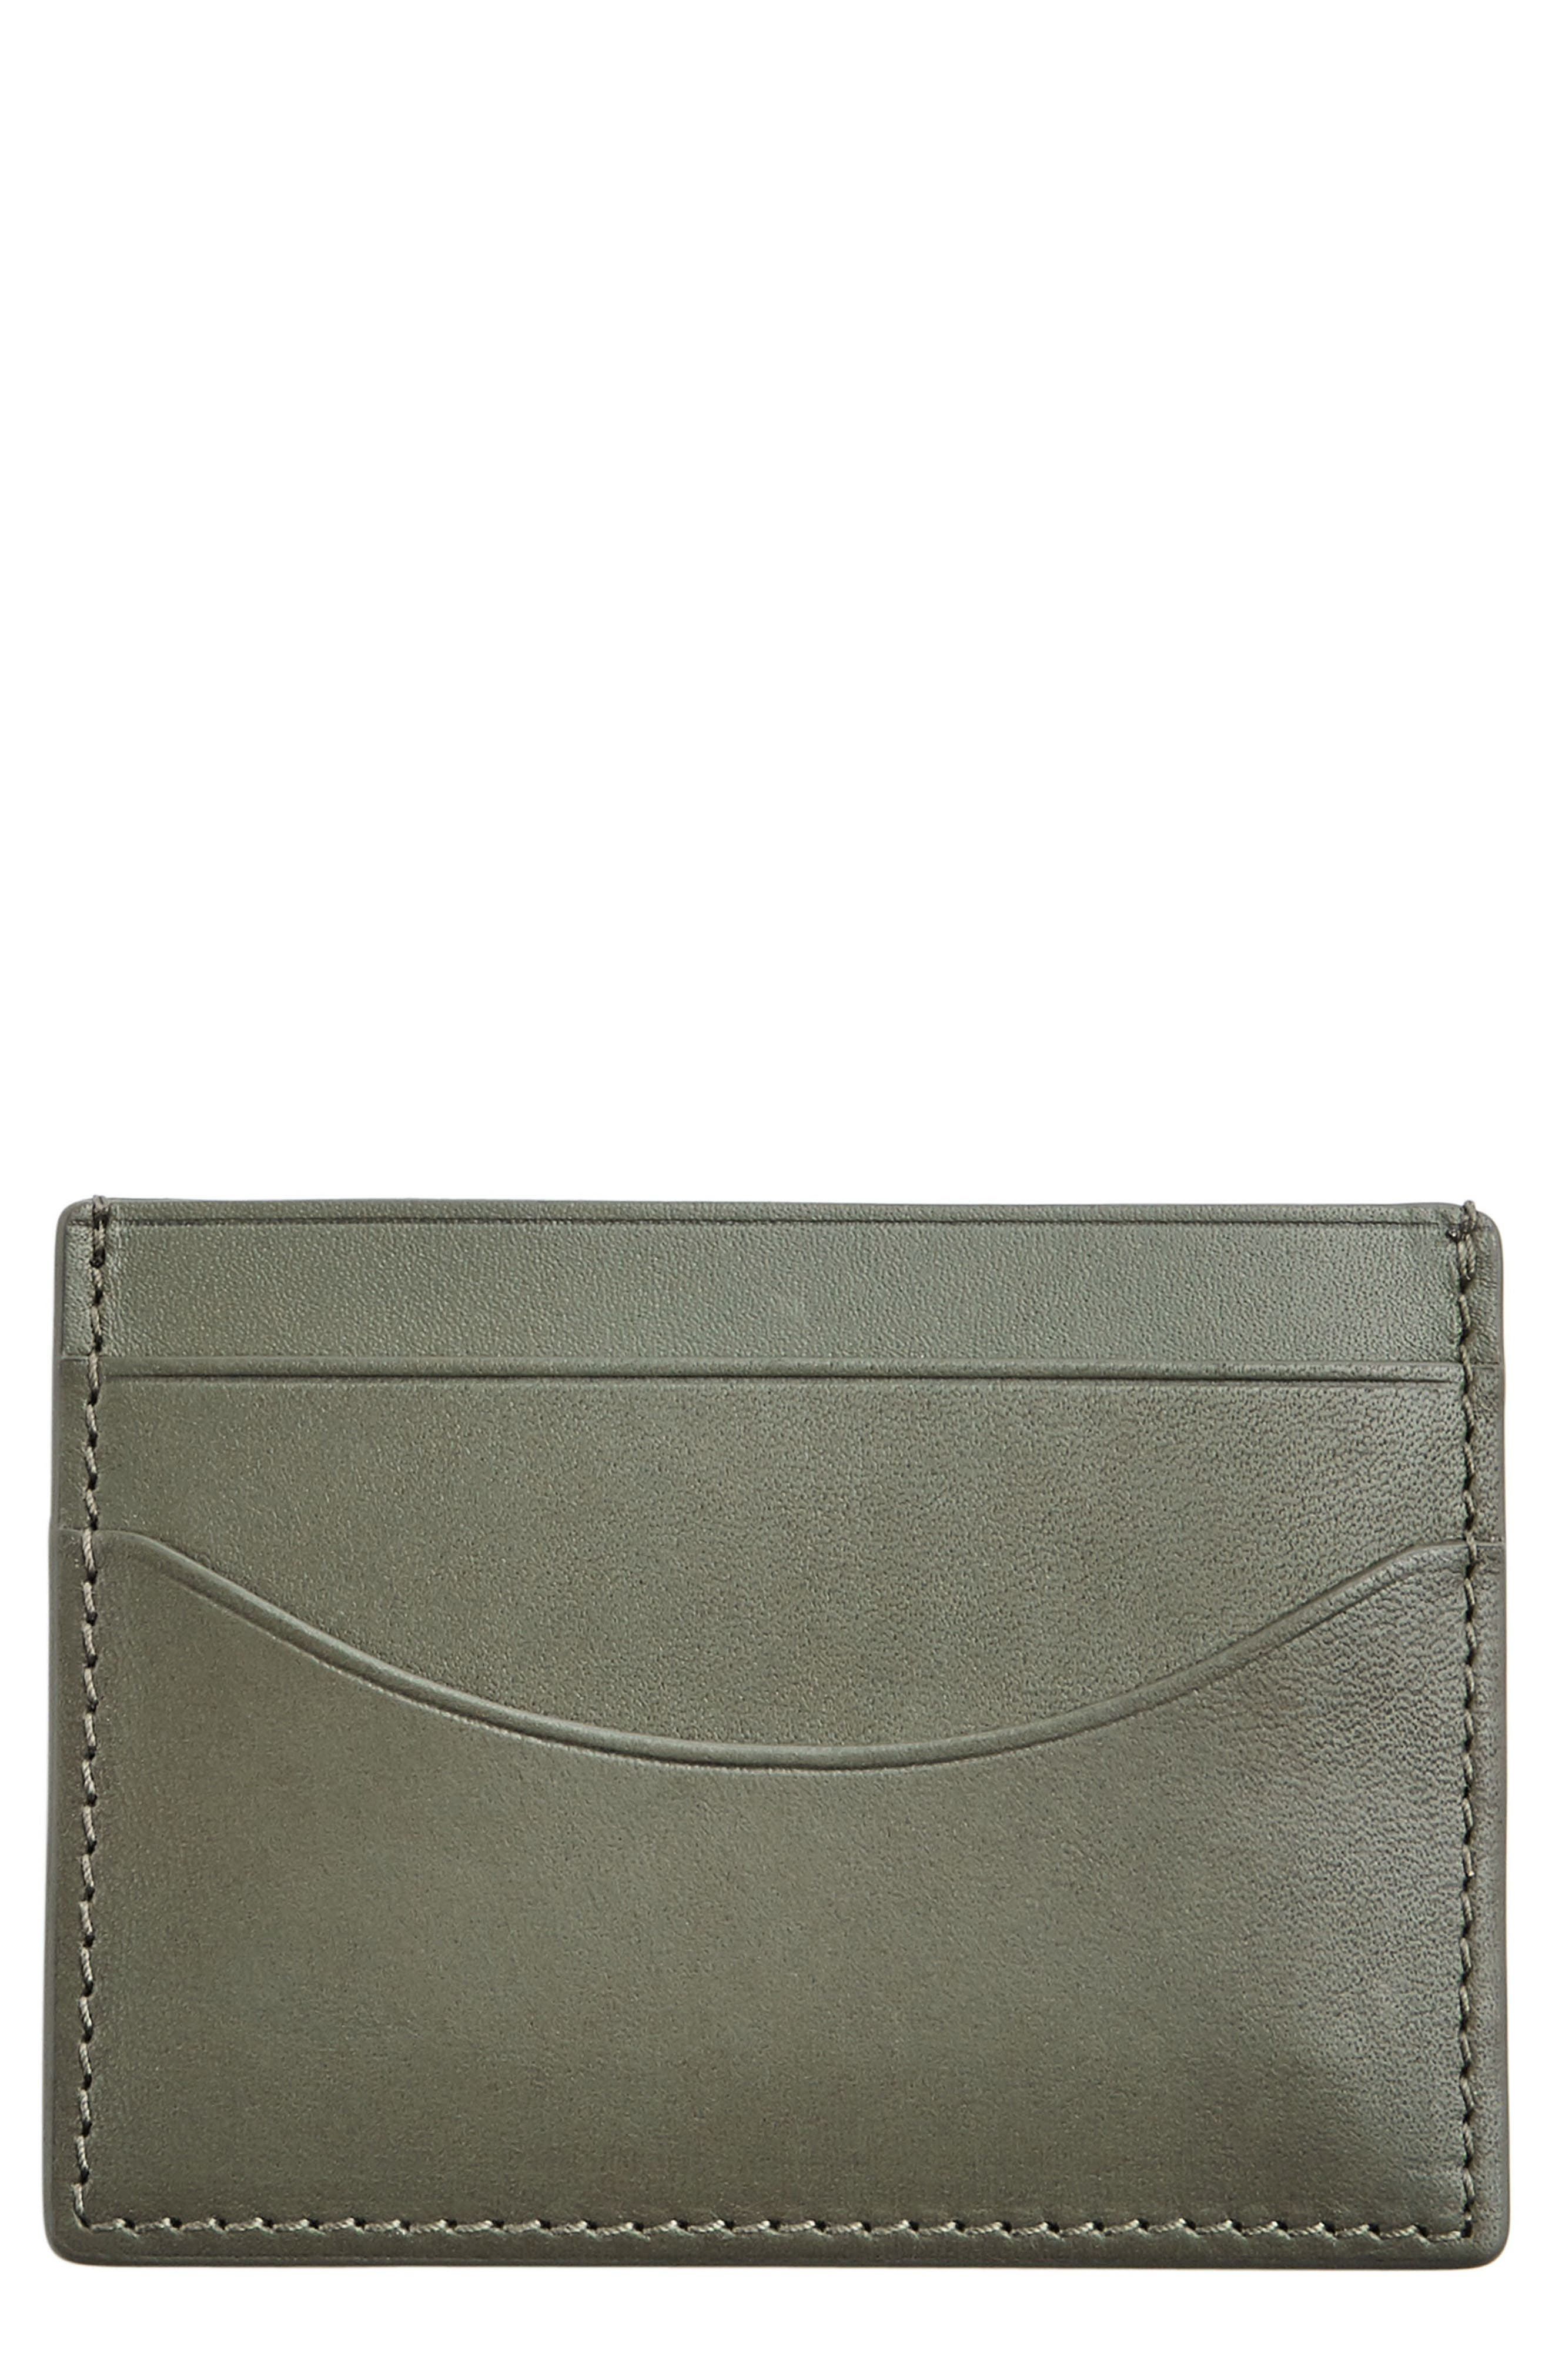 'Torben' Leather Card Case,                         Main,                         color, 357